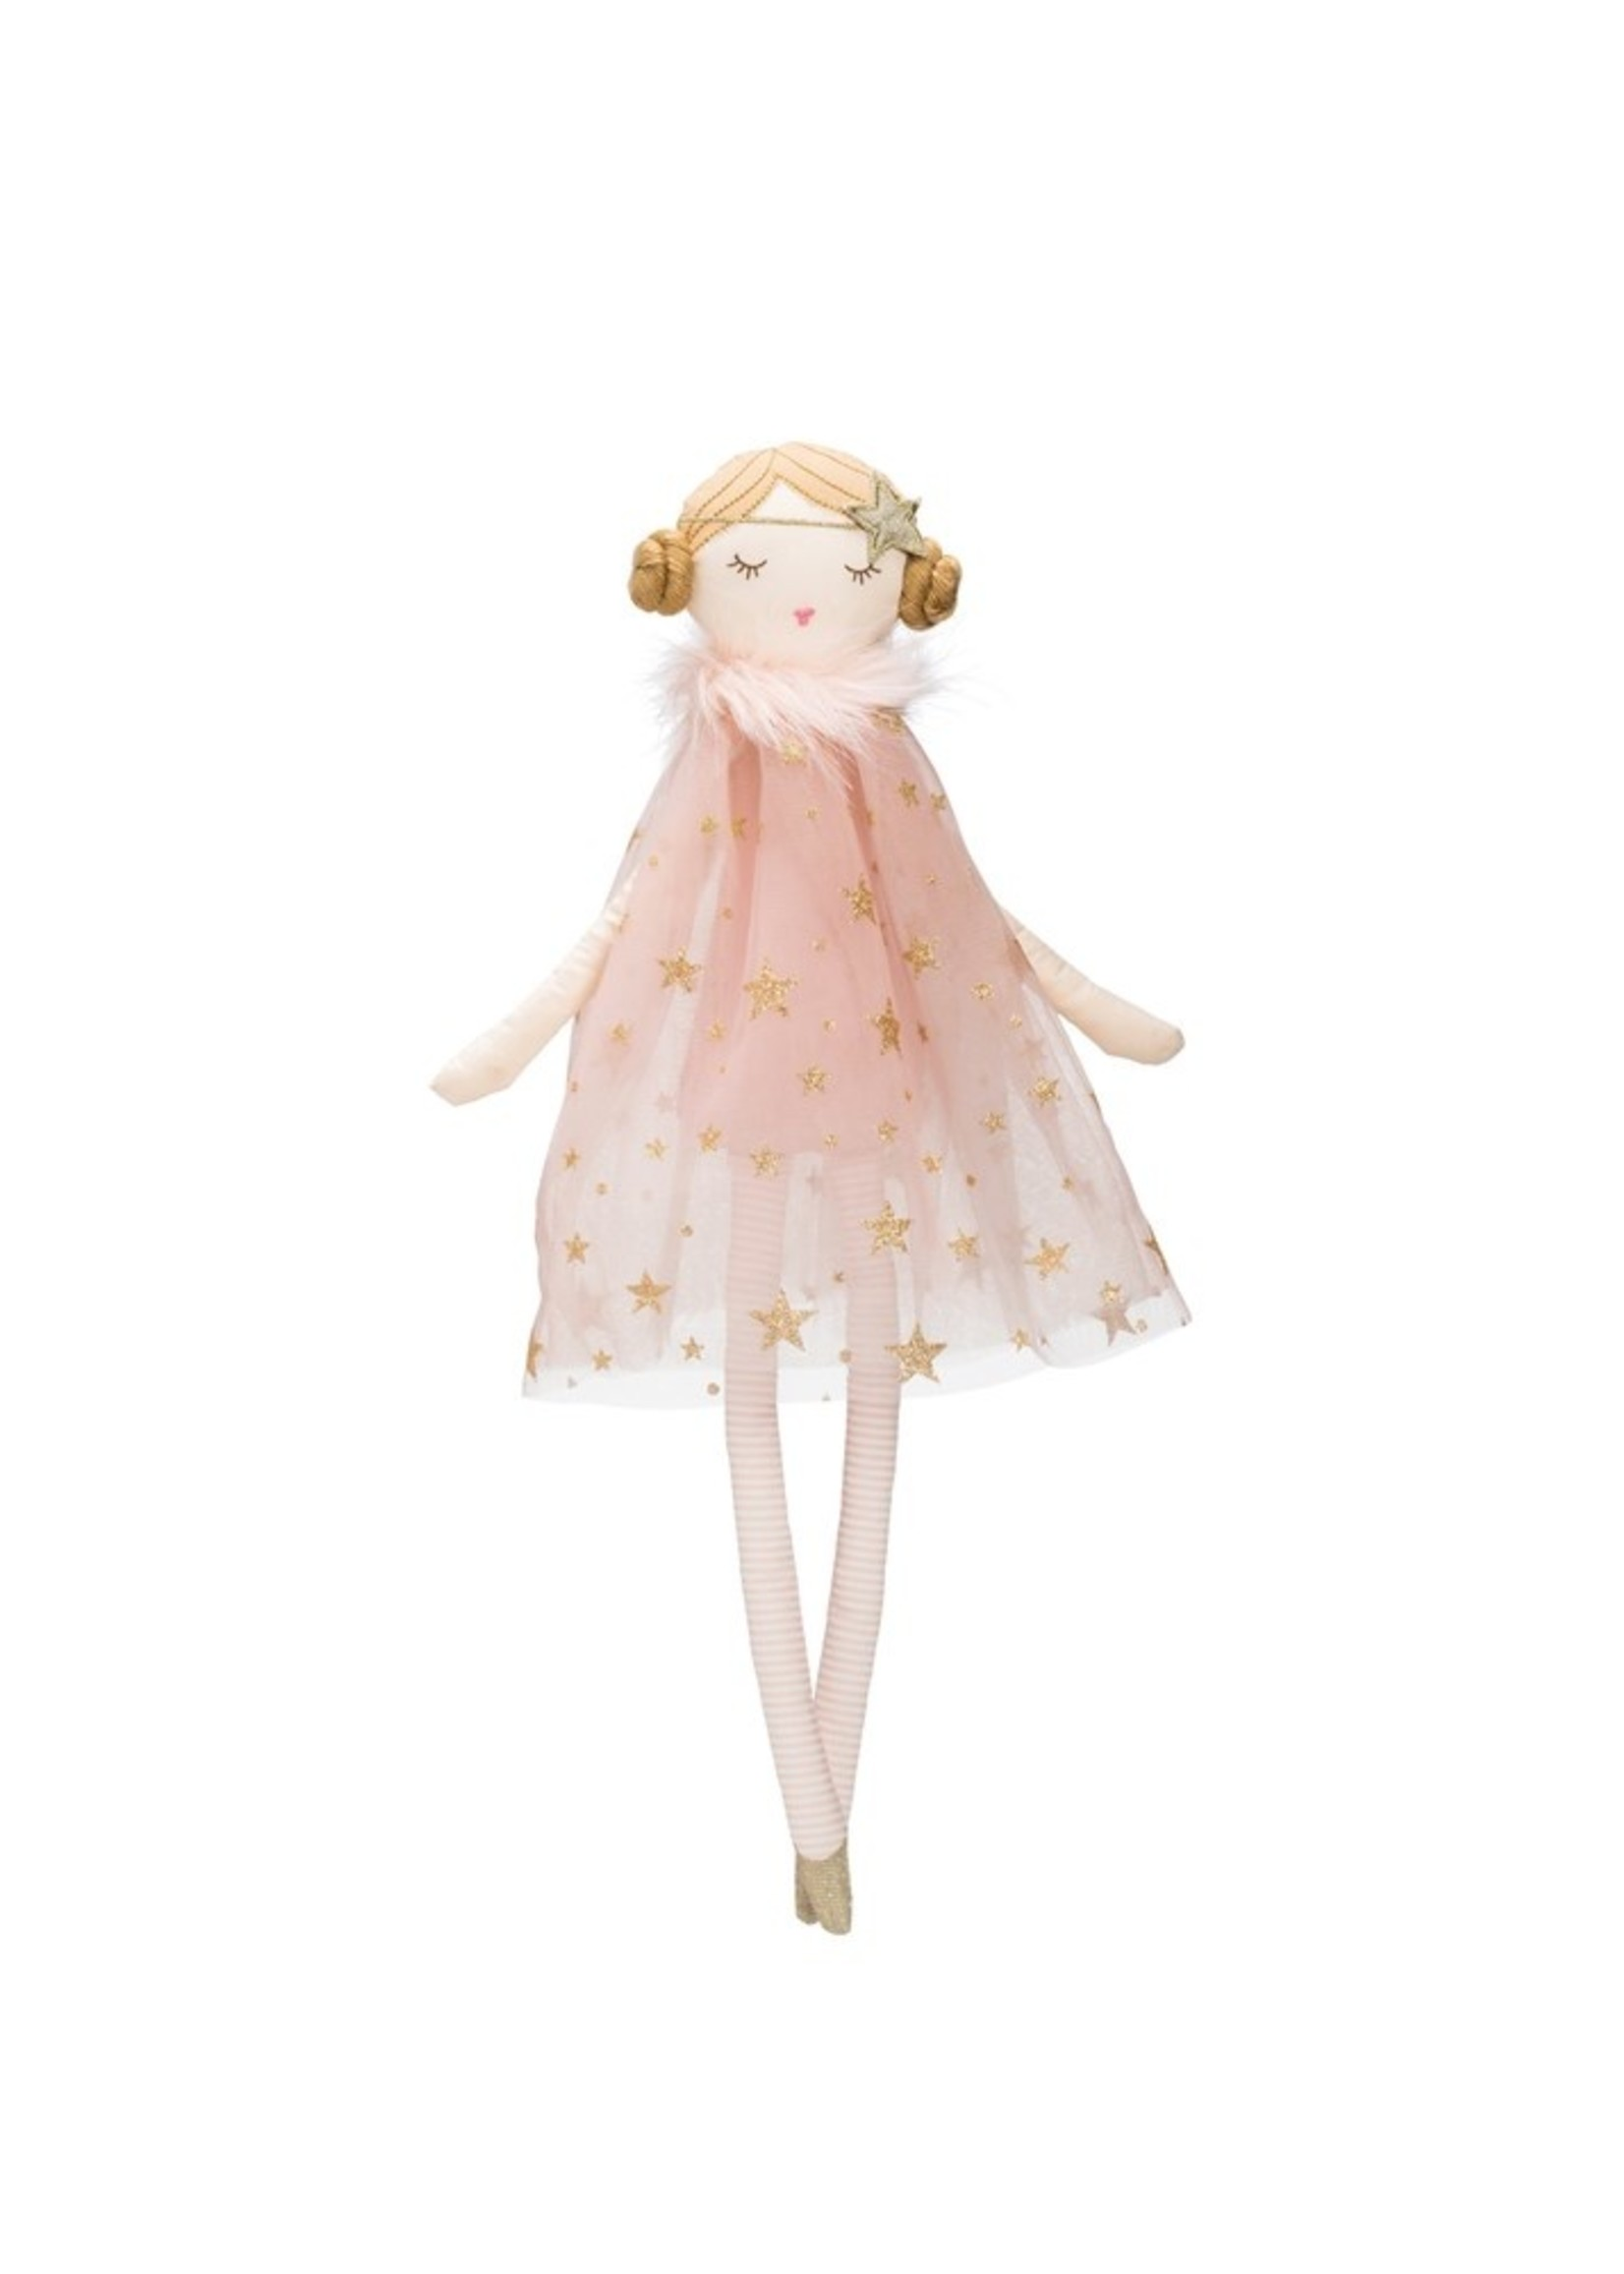 Cotton Doll w/ Star Dress, Pink